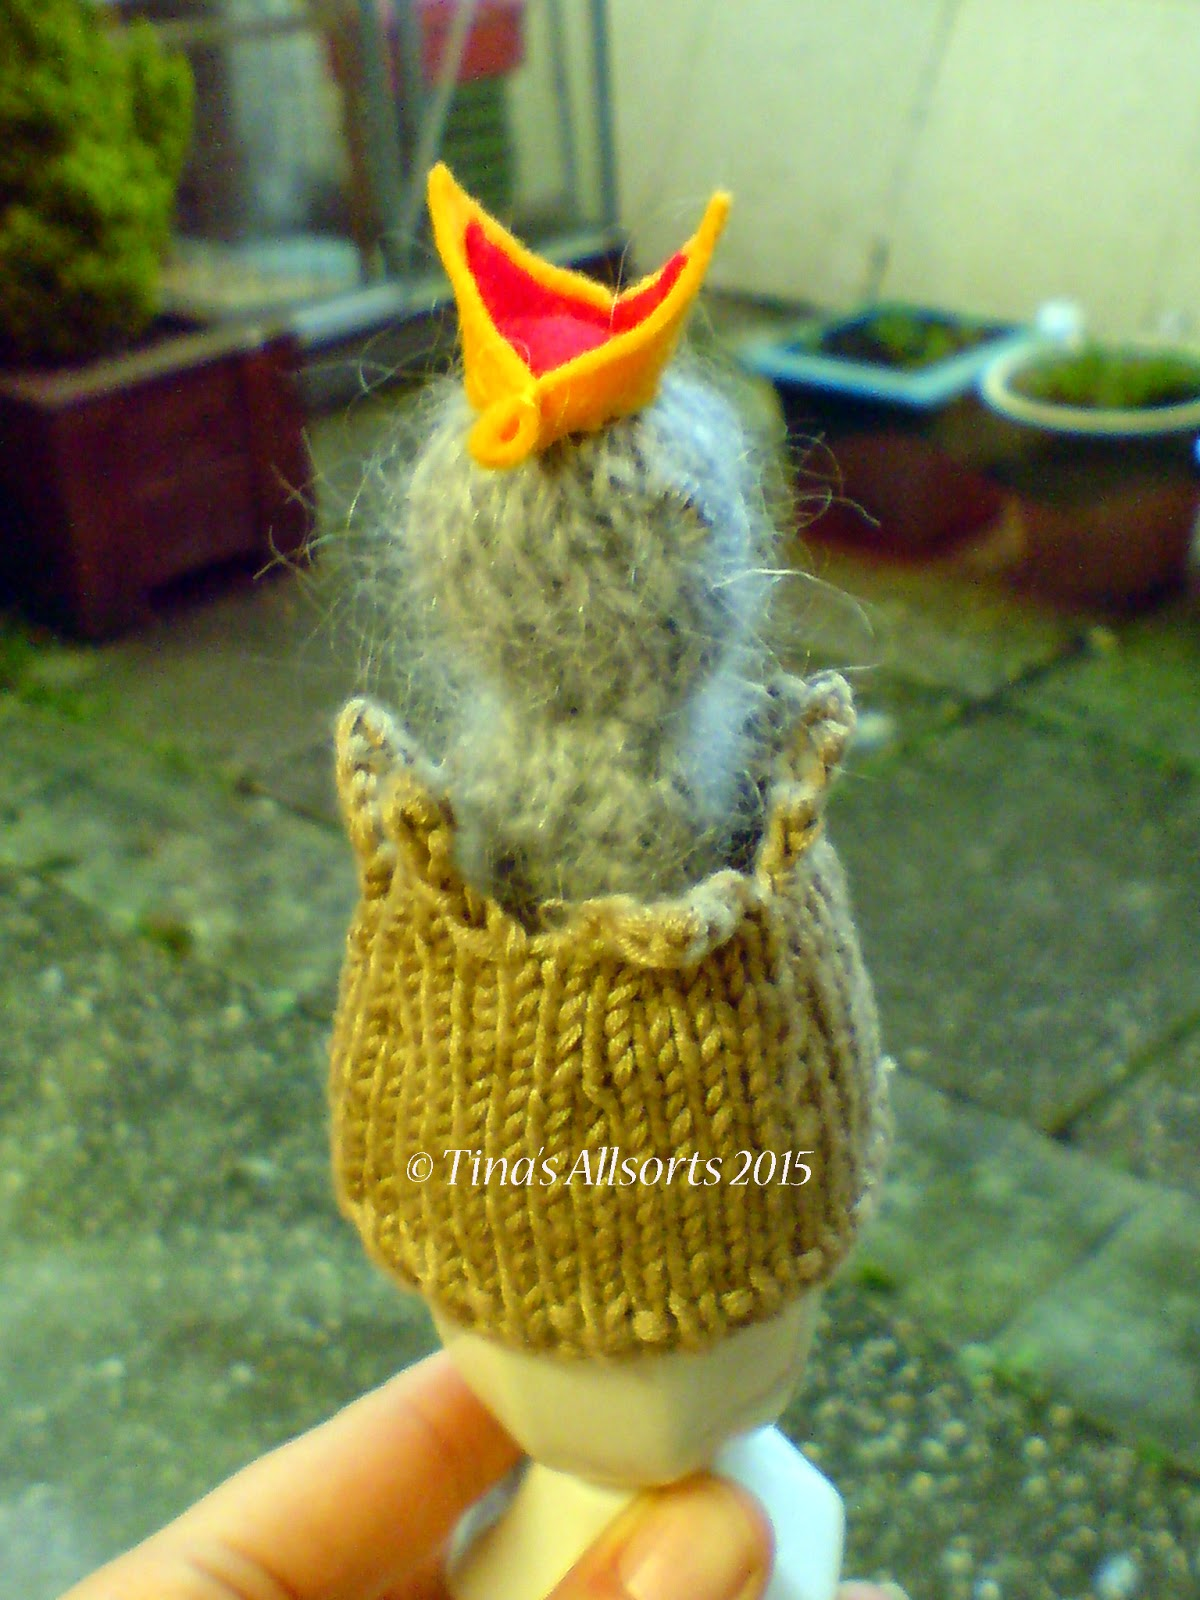 Tina's Allsorts baby bird egg cosie